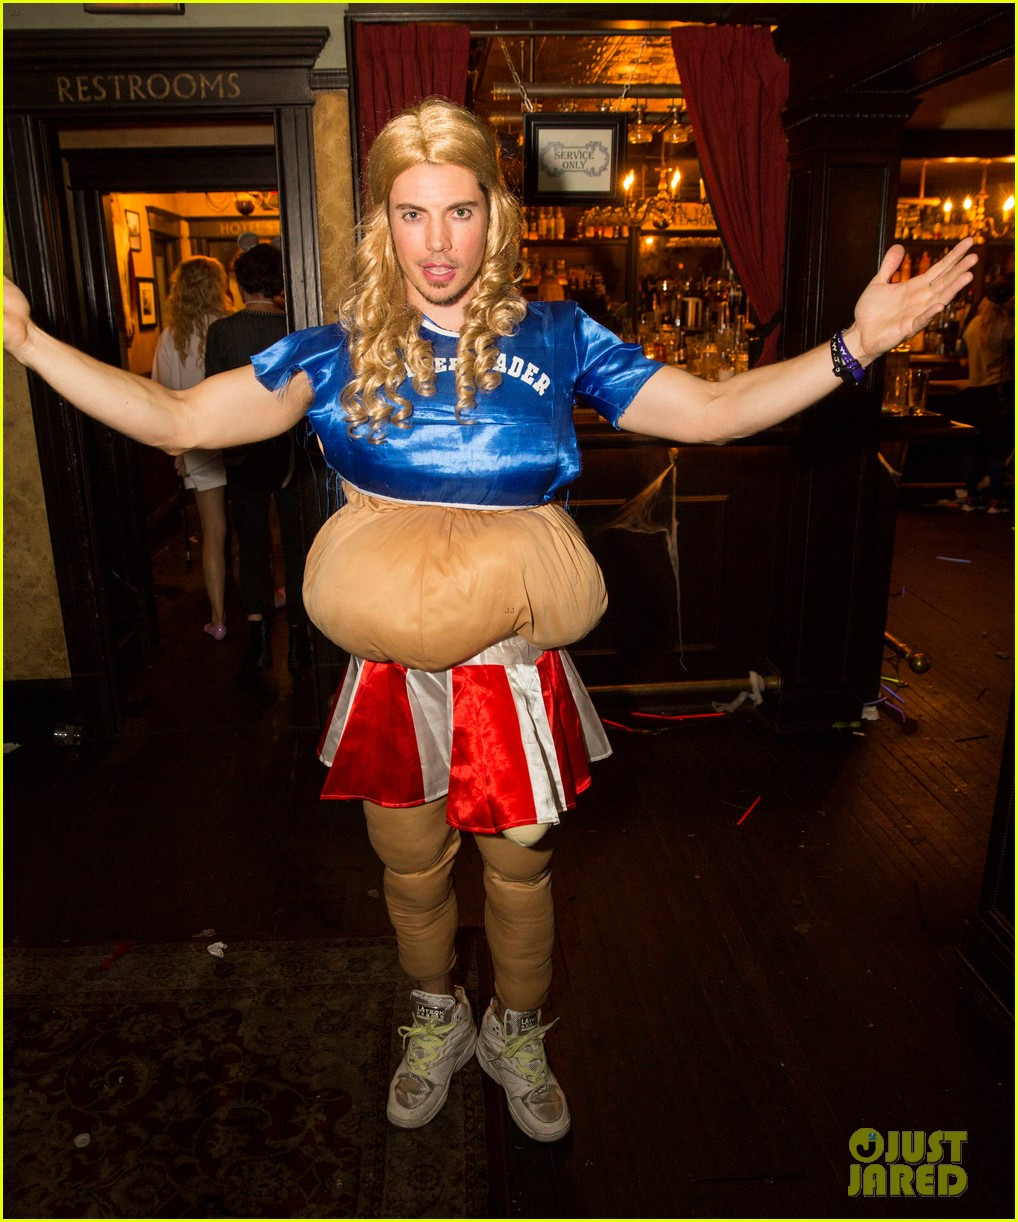 Just Jared's Halloween Party 2014: 'JJ Freak Show' - RECAP: Photo ...